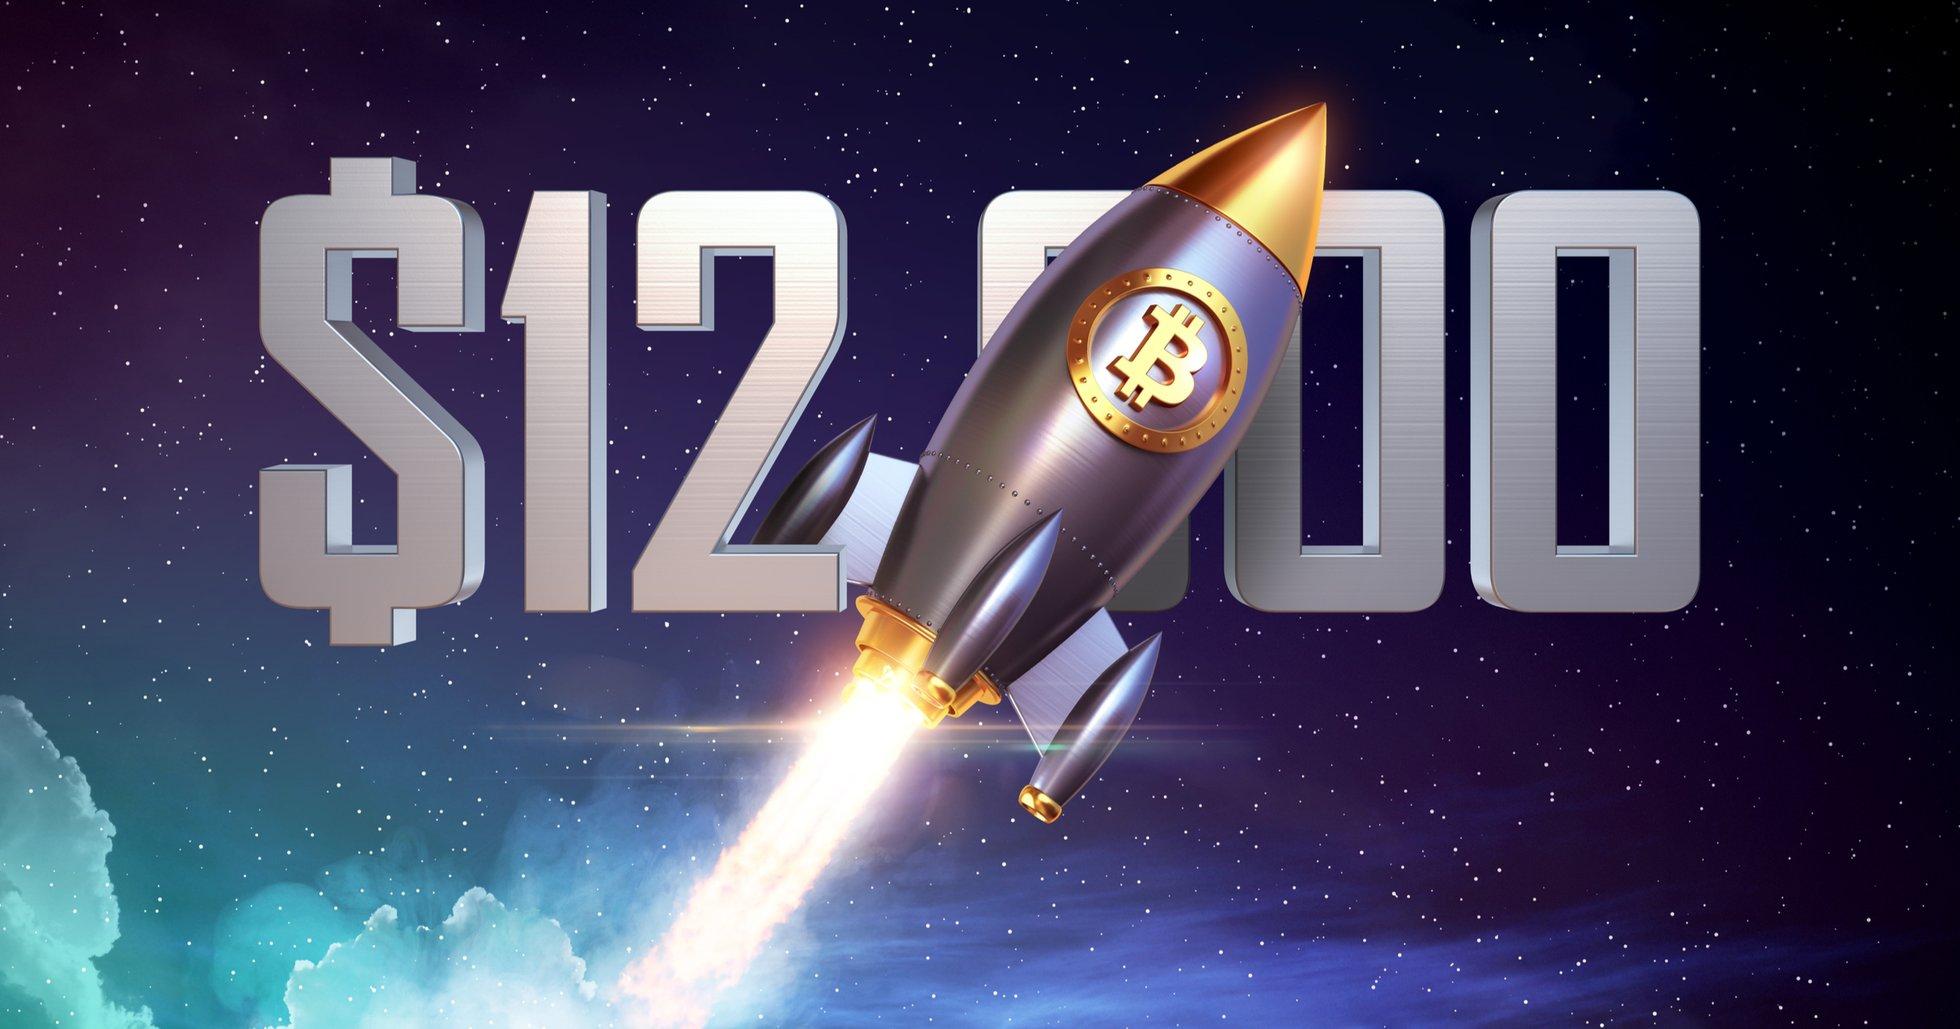 Bitcoinpriset har ökat nästan 5 procent senaste dygnet – närmar sig 12 000 dollar.